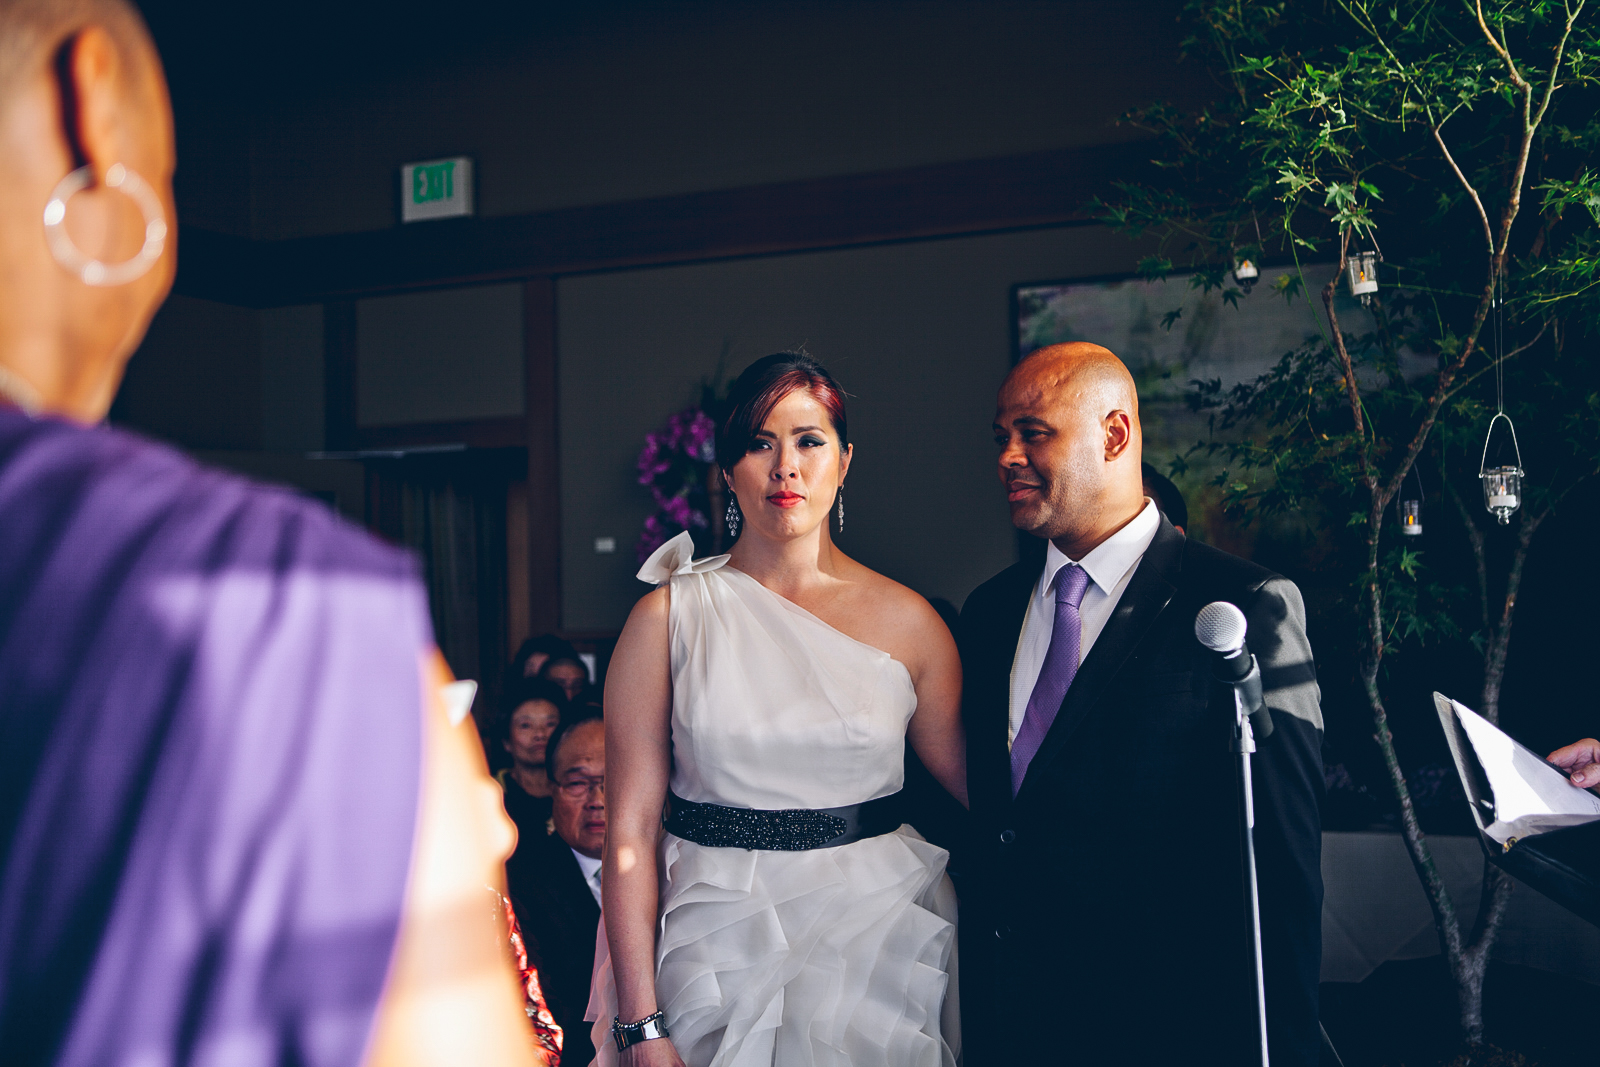 greens_restaurant_wedding_photography_san_franscisco_ebony_siovhan_bokeh_photography_47.jpg